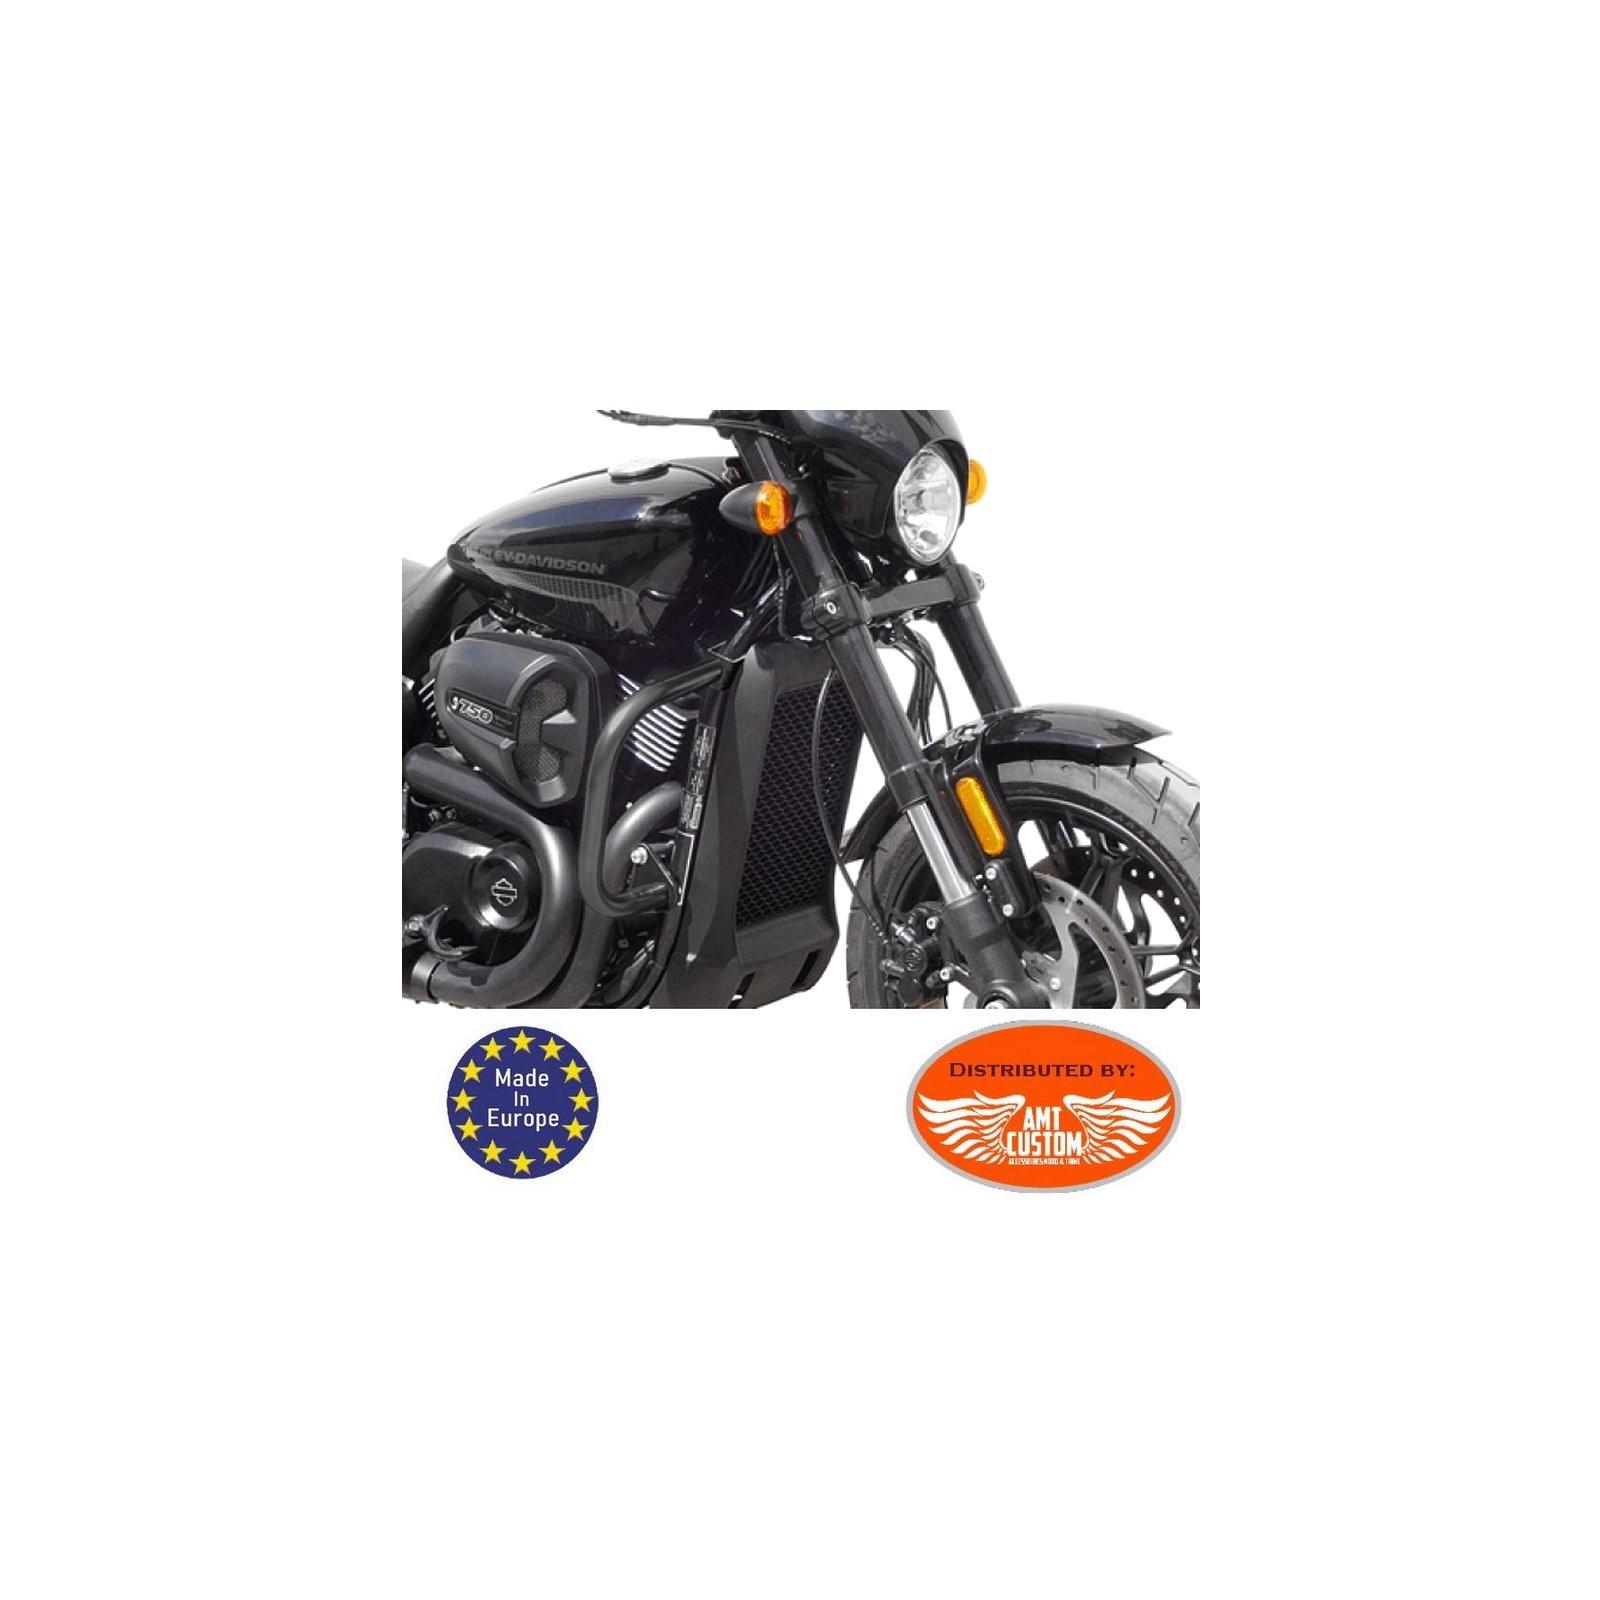 Pare-carter Repose-pieds cf1b pour Harley Softail SPORT GLIDE Street 750